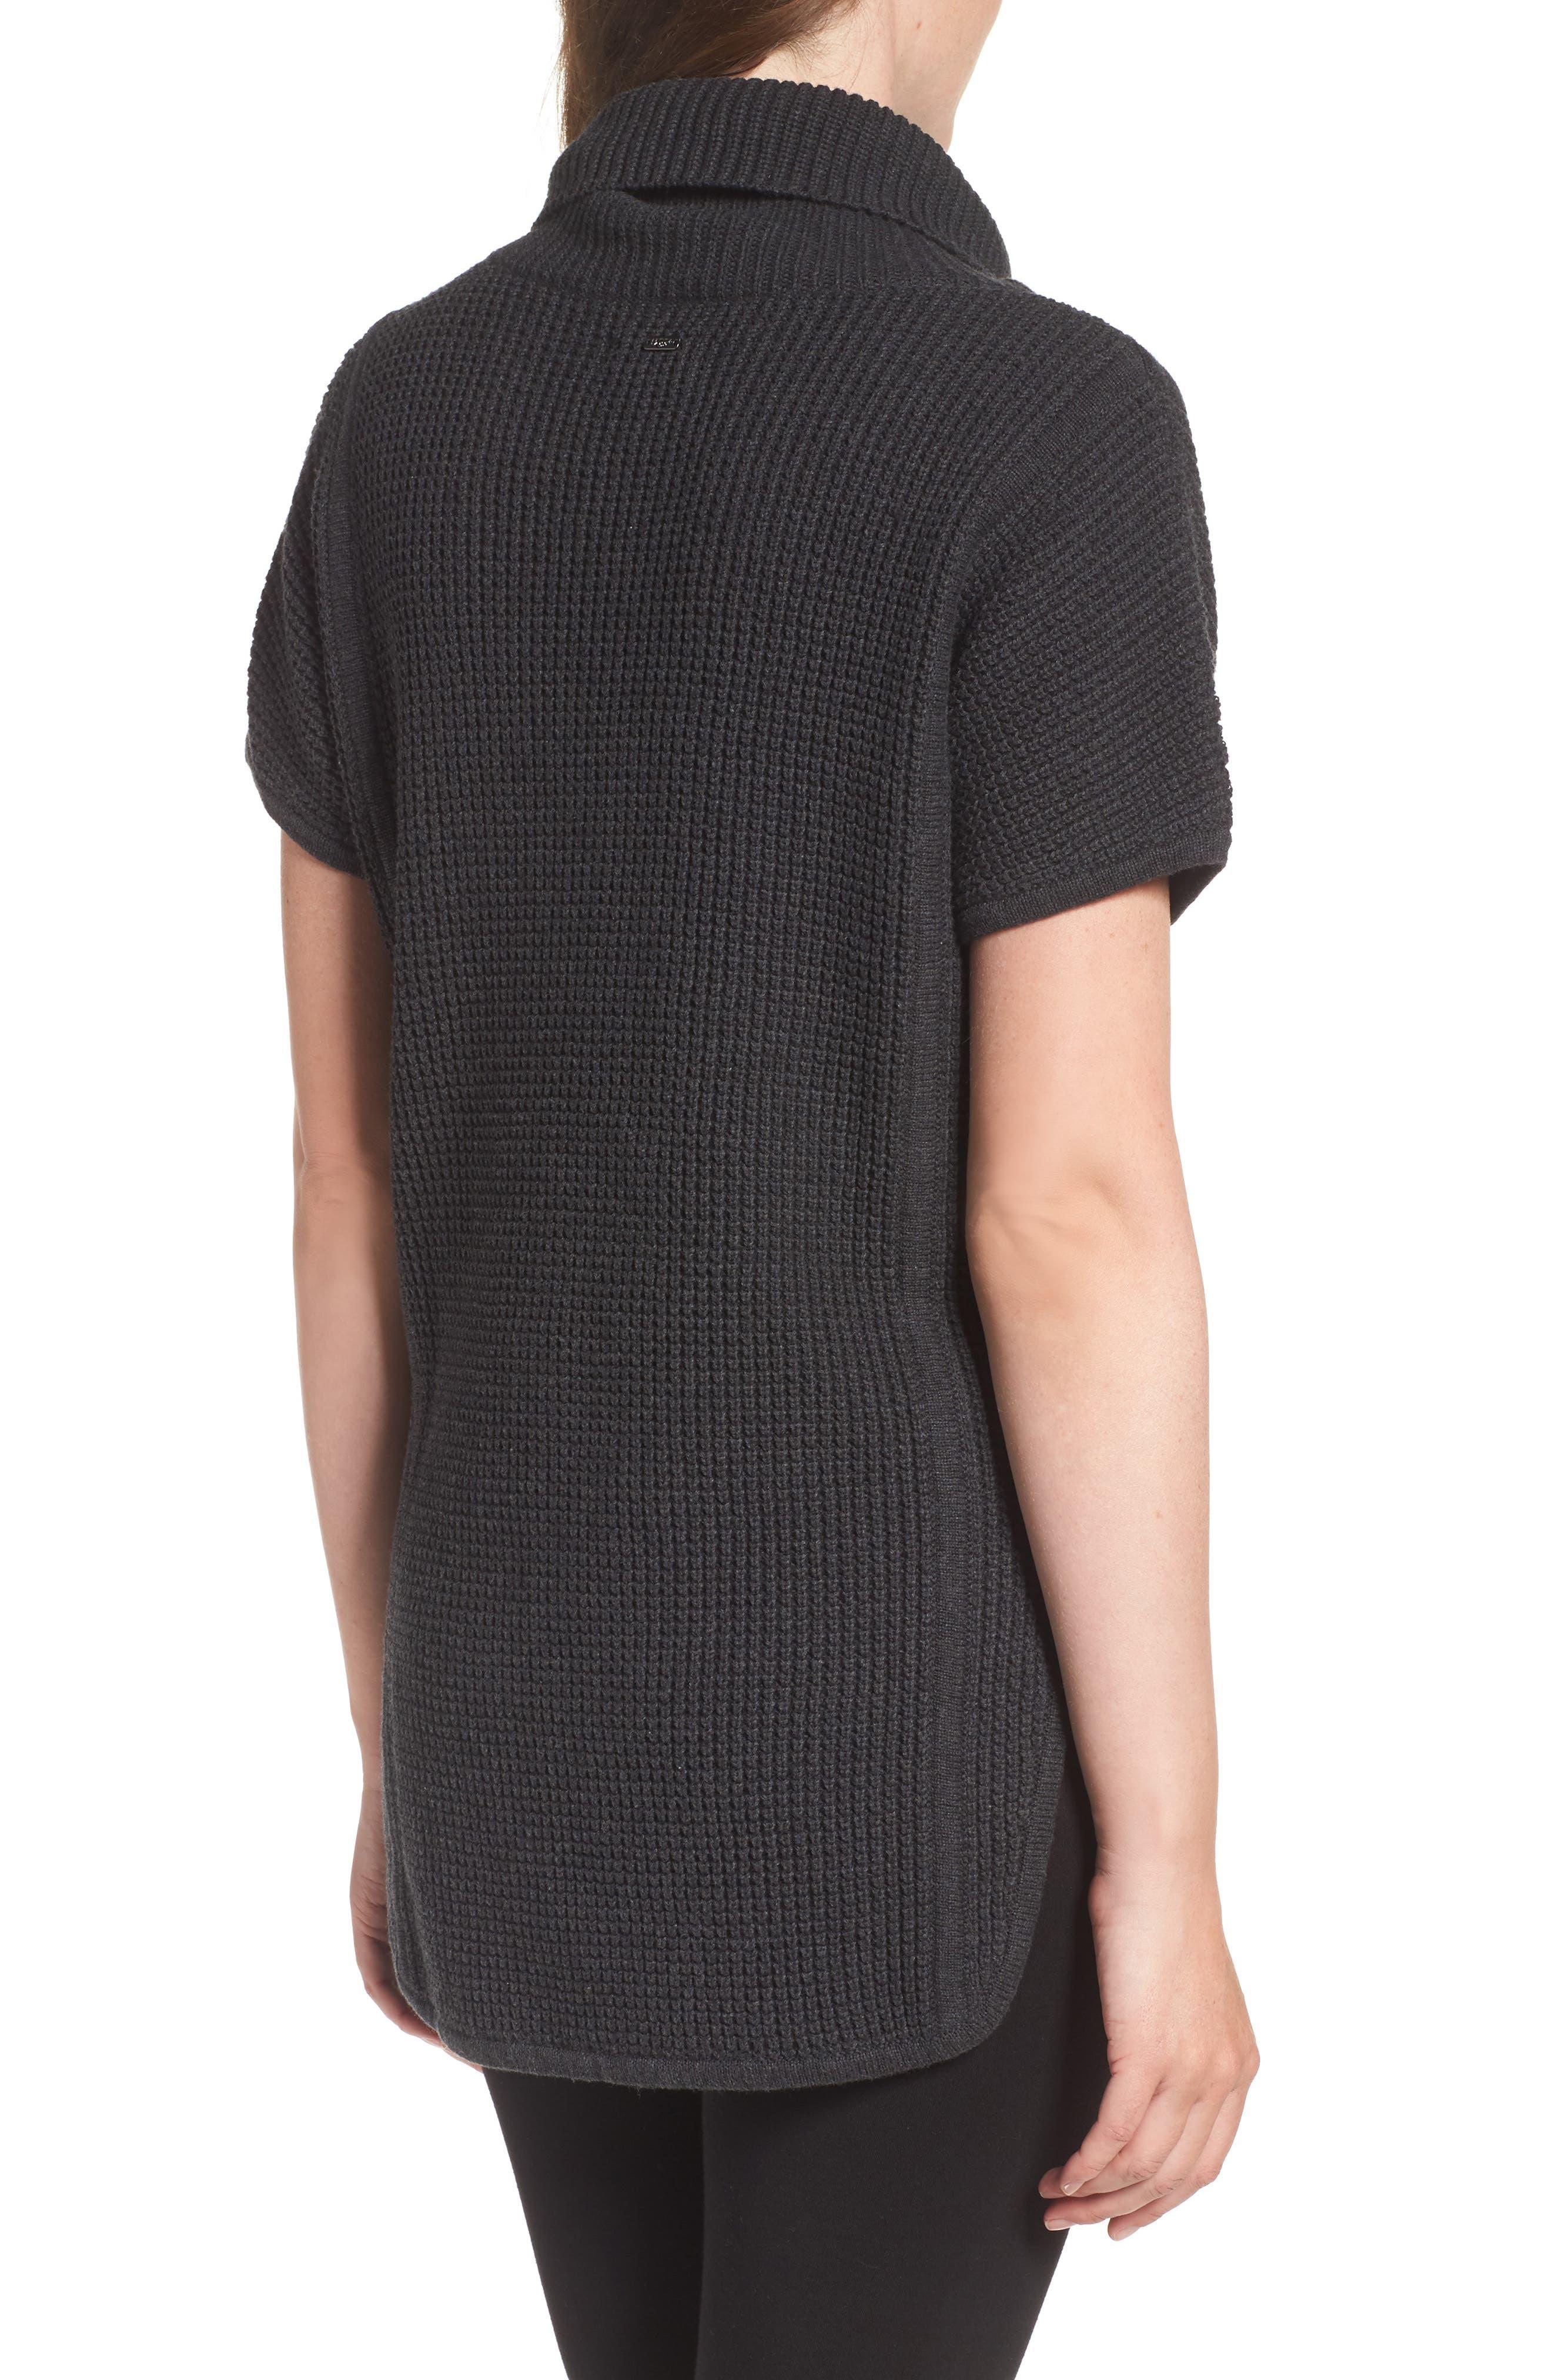 Alternate Image 2  - UGG® 'Selby' Turtleneck Cotton Knit Pullover